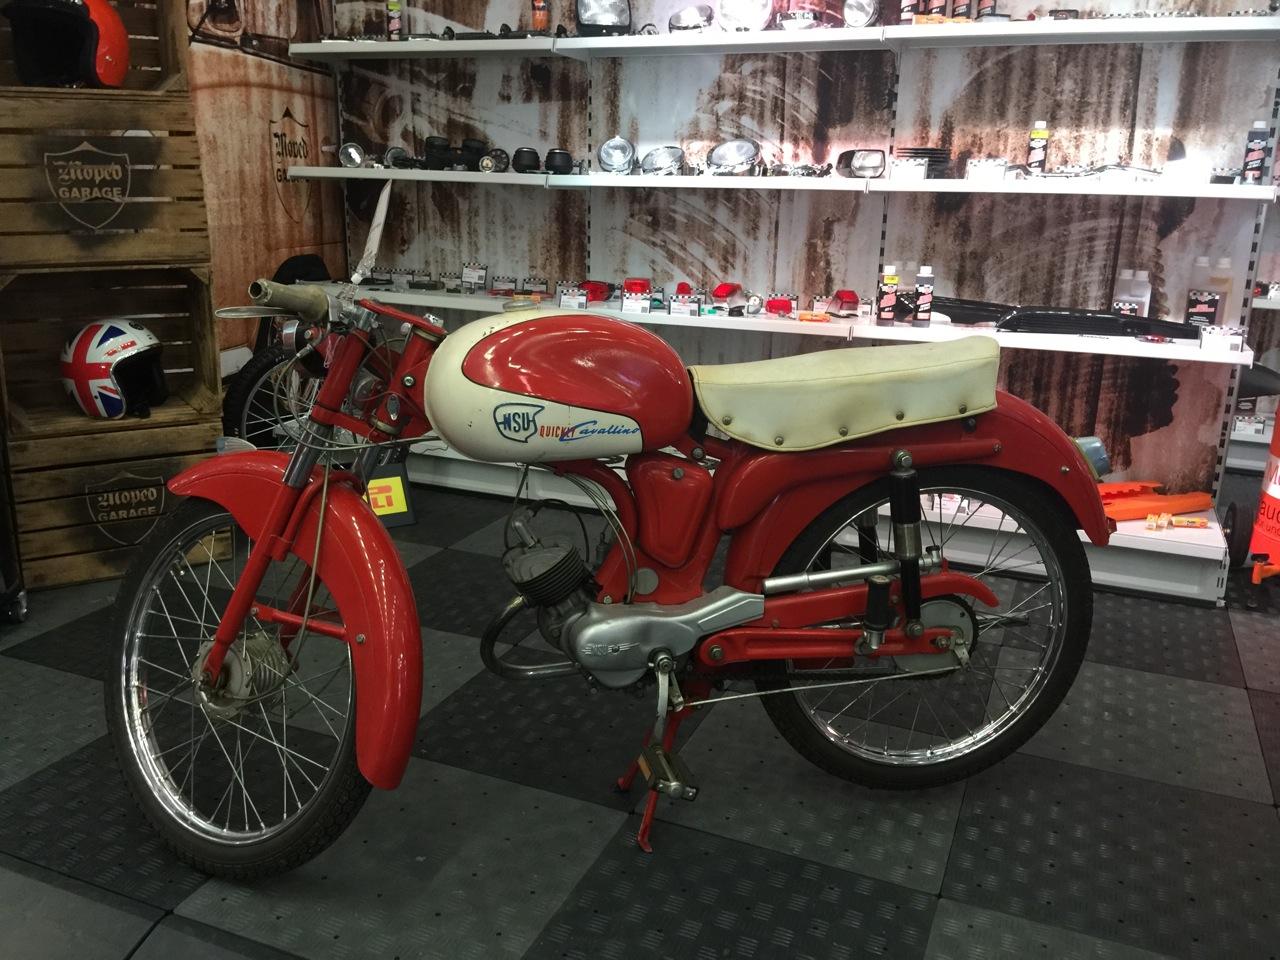 nsu-cavalino-1958-1-3ps